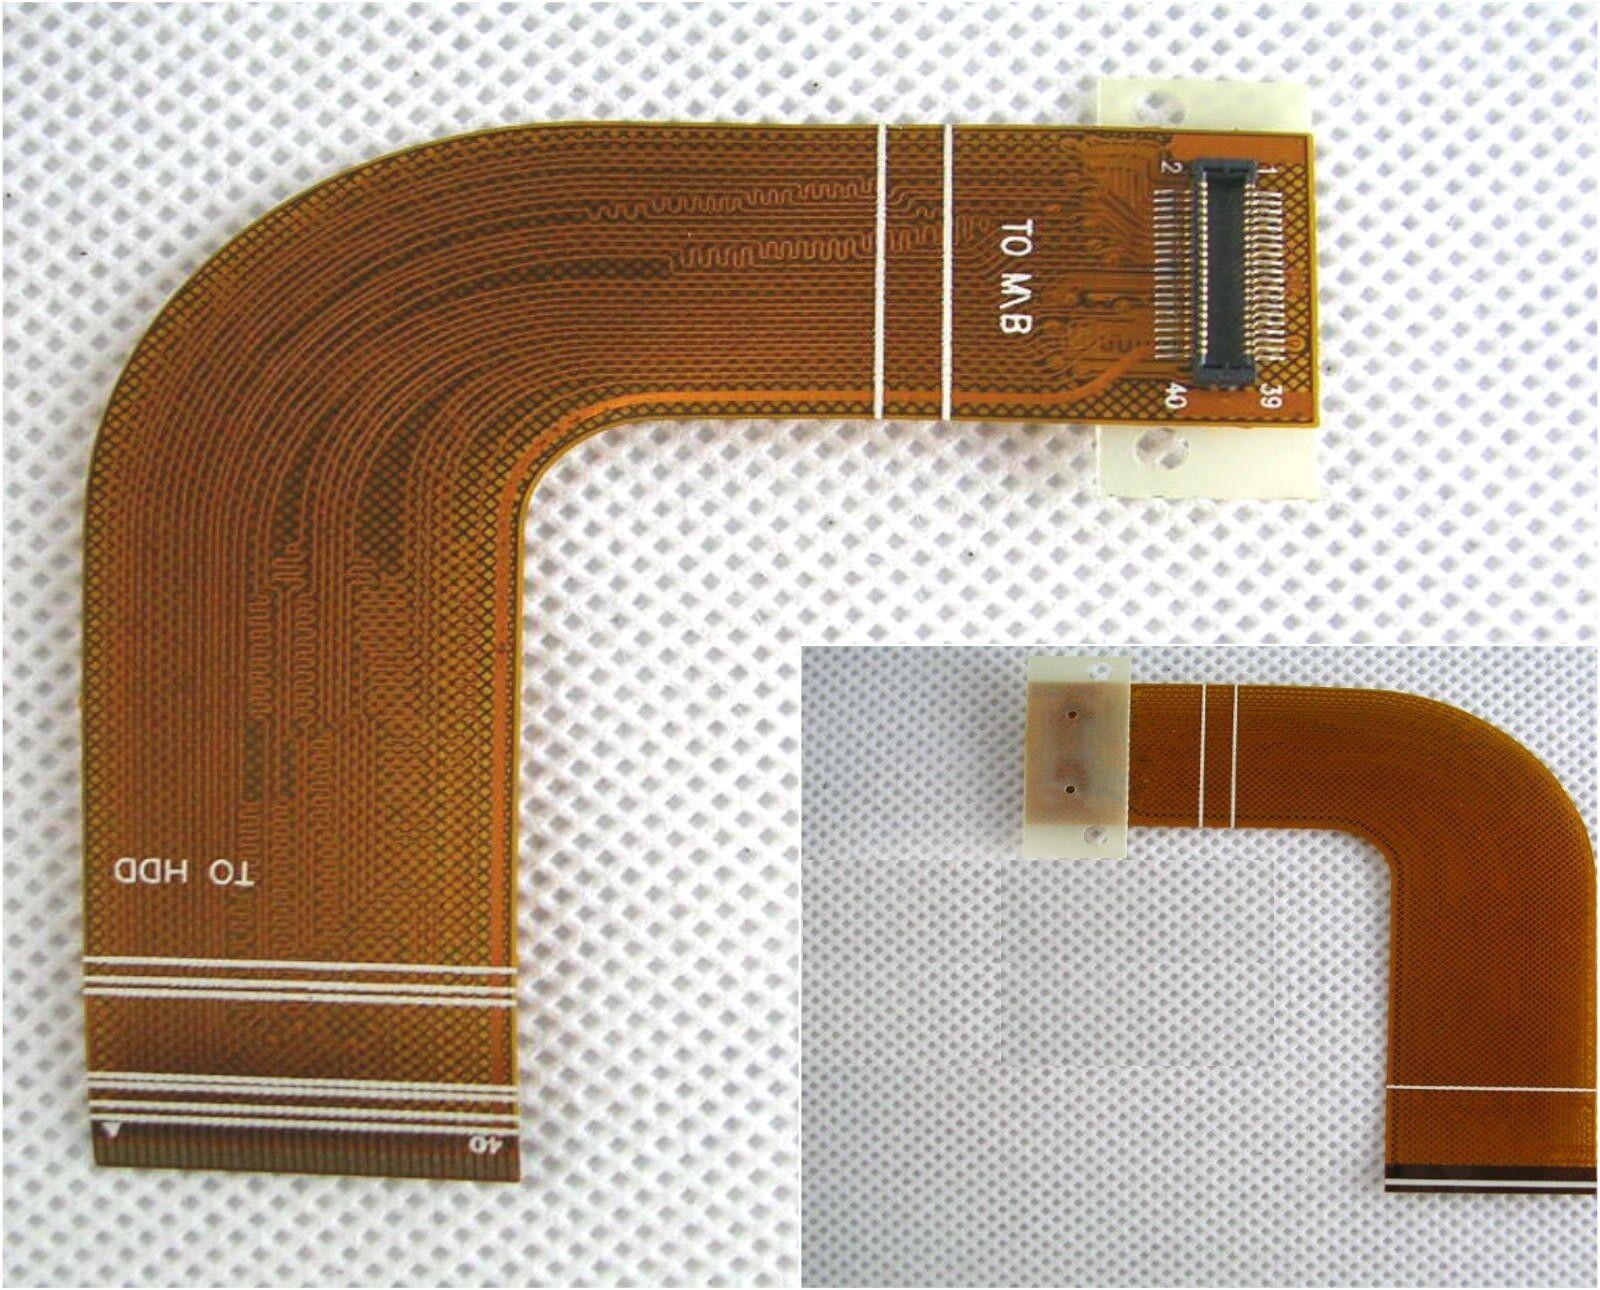 Cable HJ178 D430 Hard Drive Bracket Complete W Rubber GJ277 Dell Latitude D420